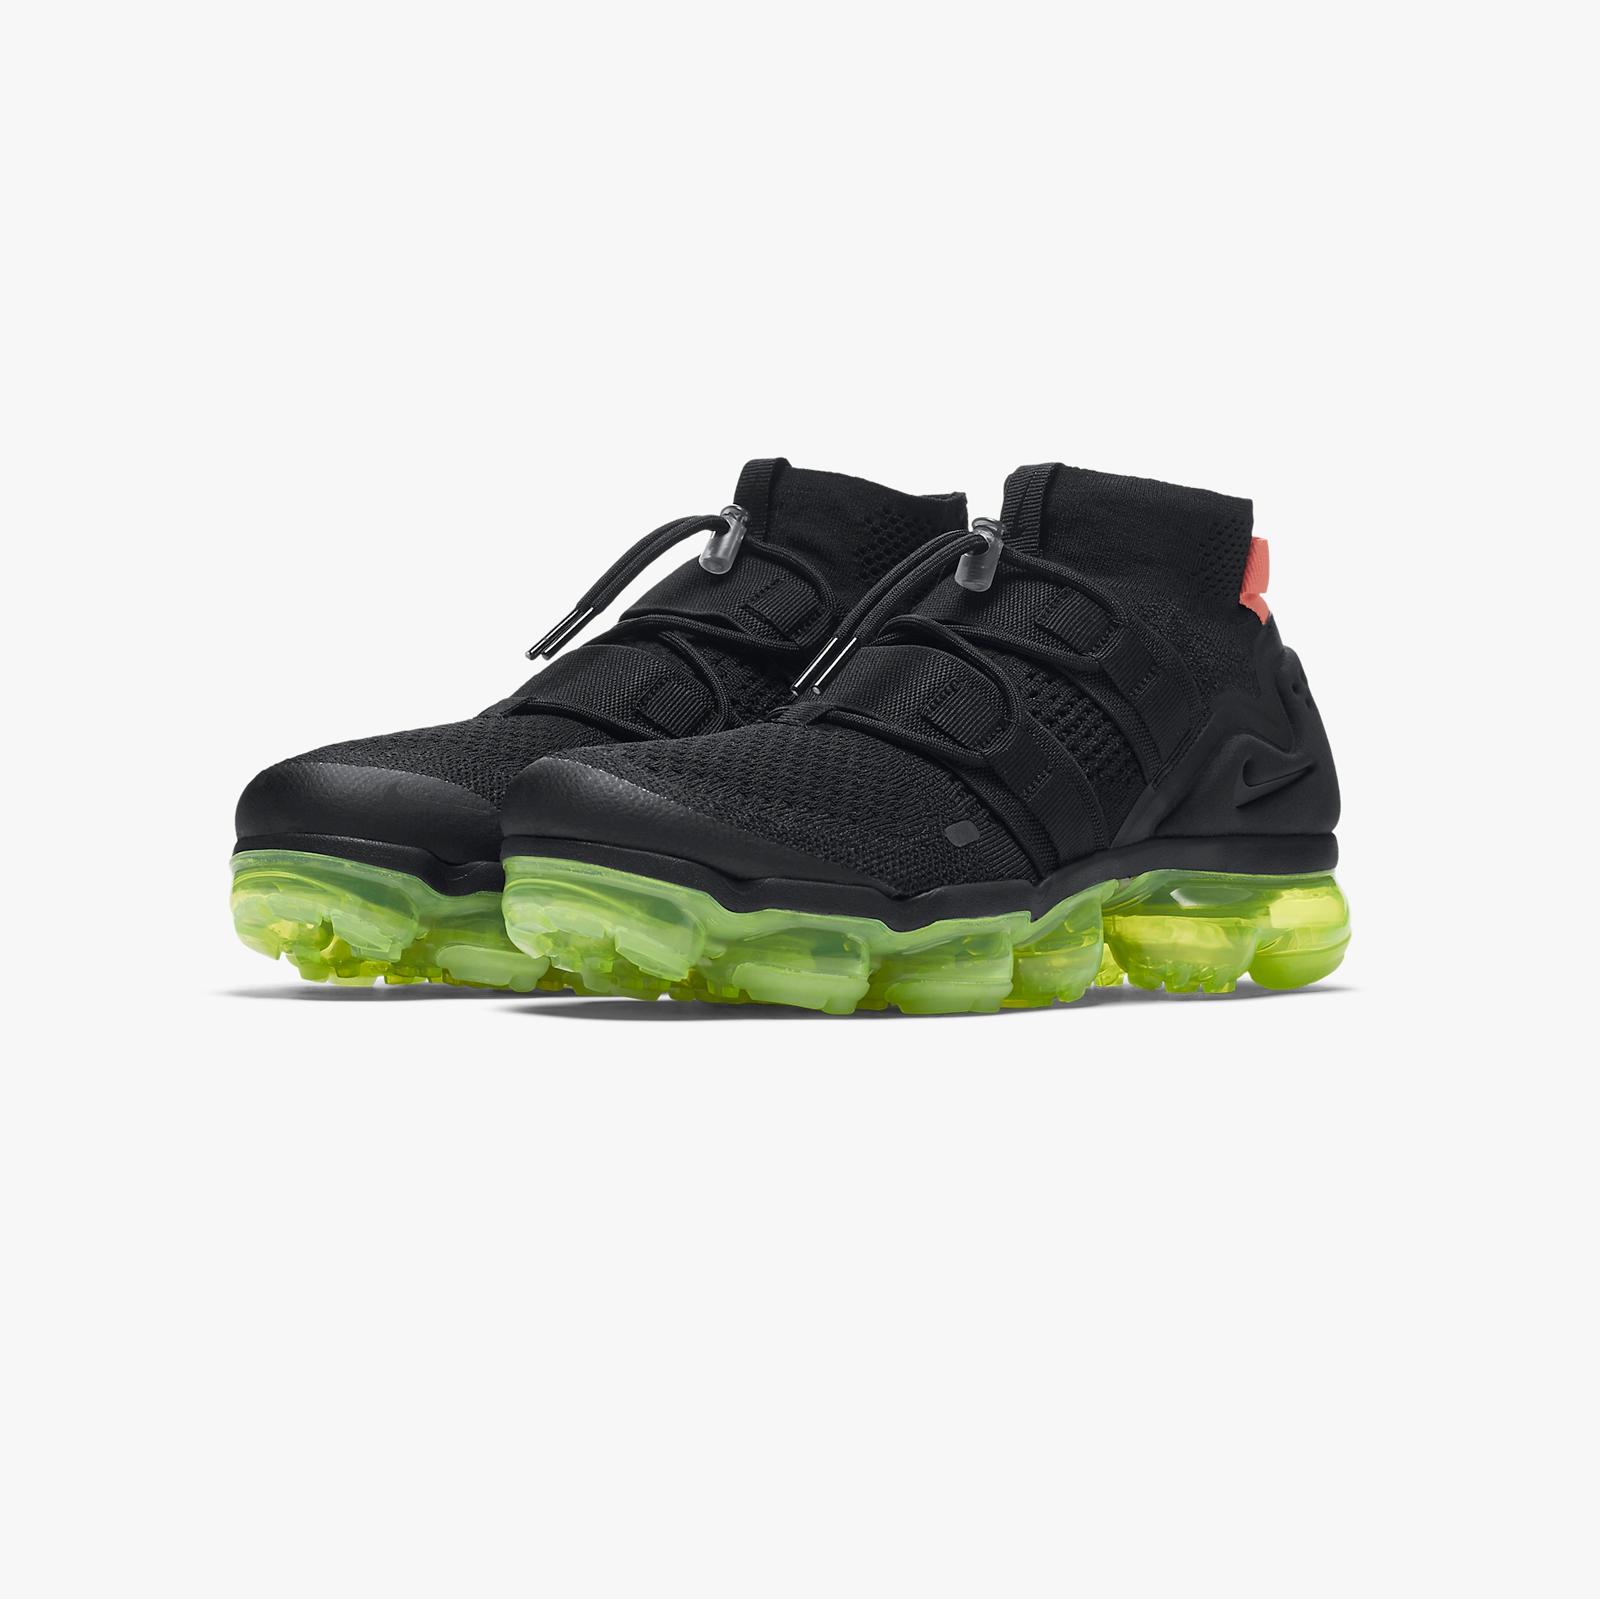 44036fab38963 Nike Air Vapormax Flyknit Utility - Ah6834-007 - Sneakersnstuff ...